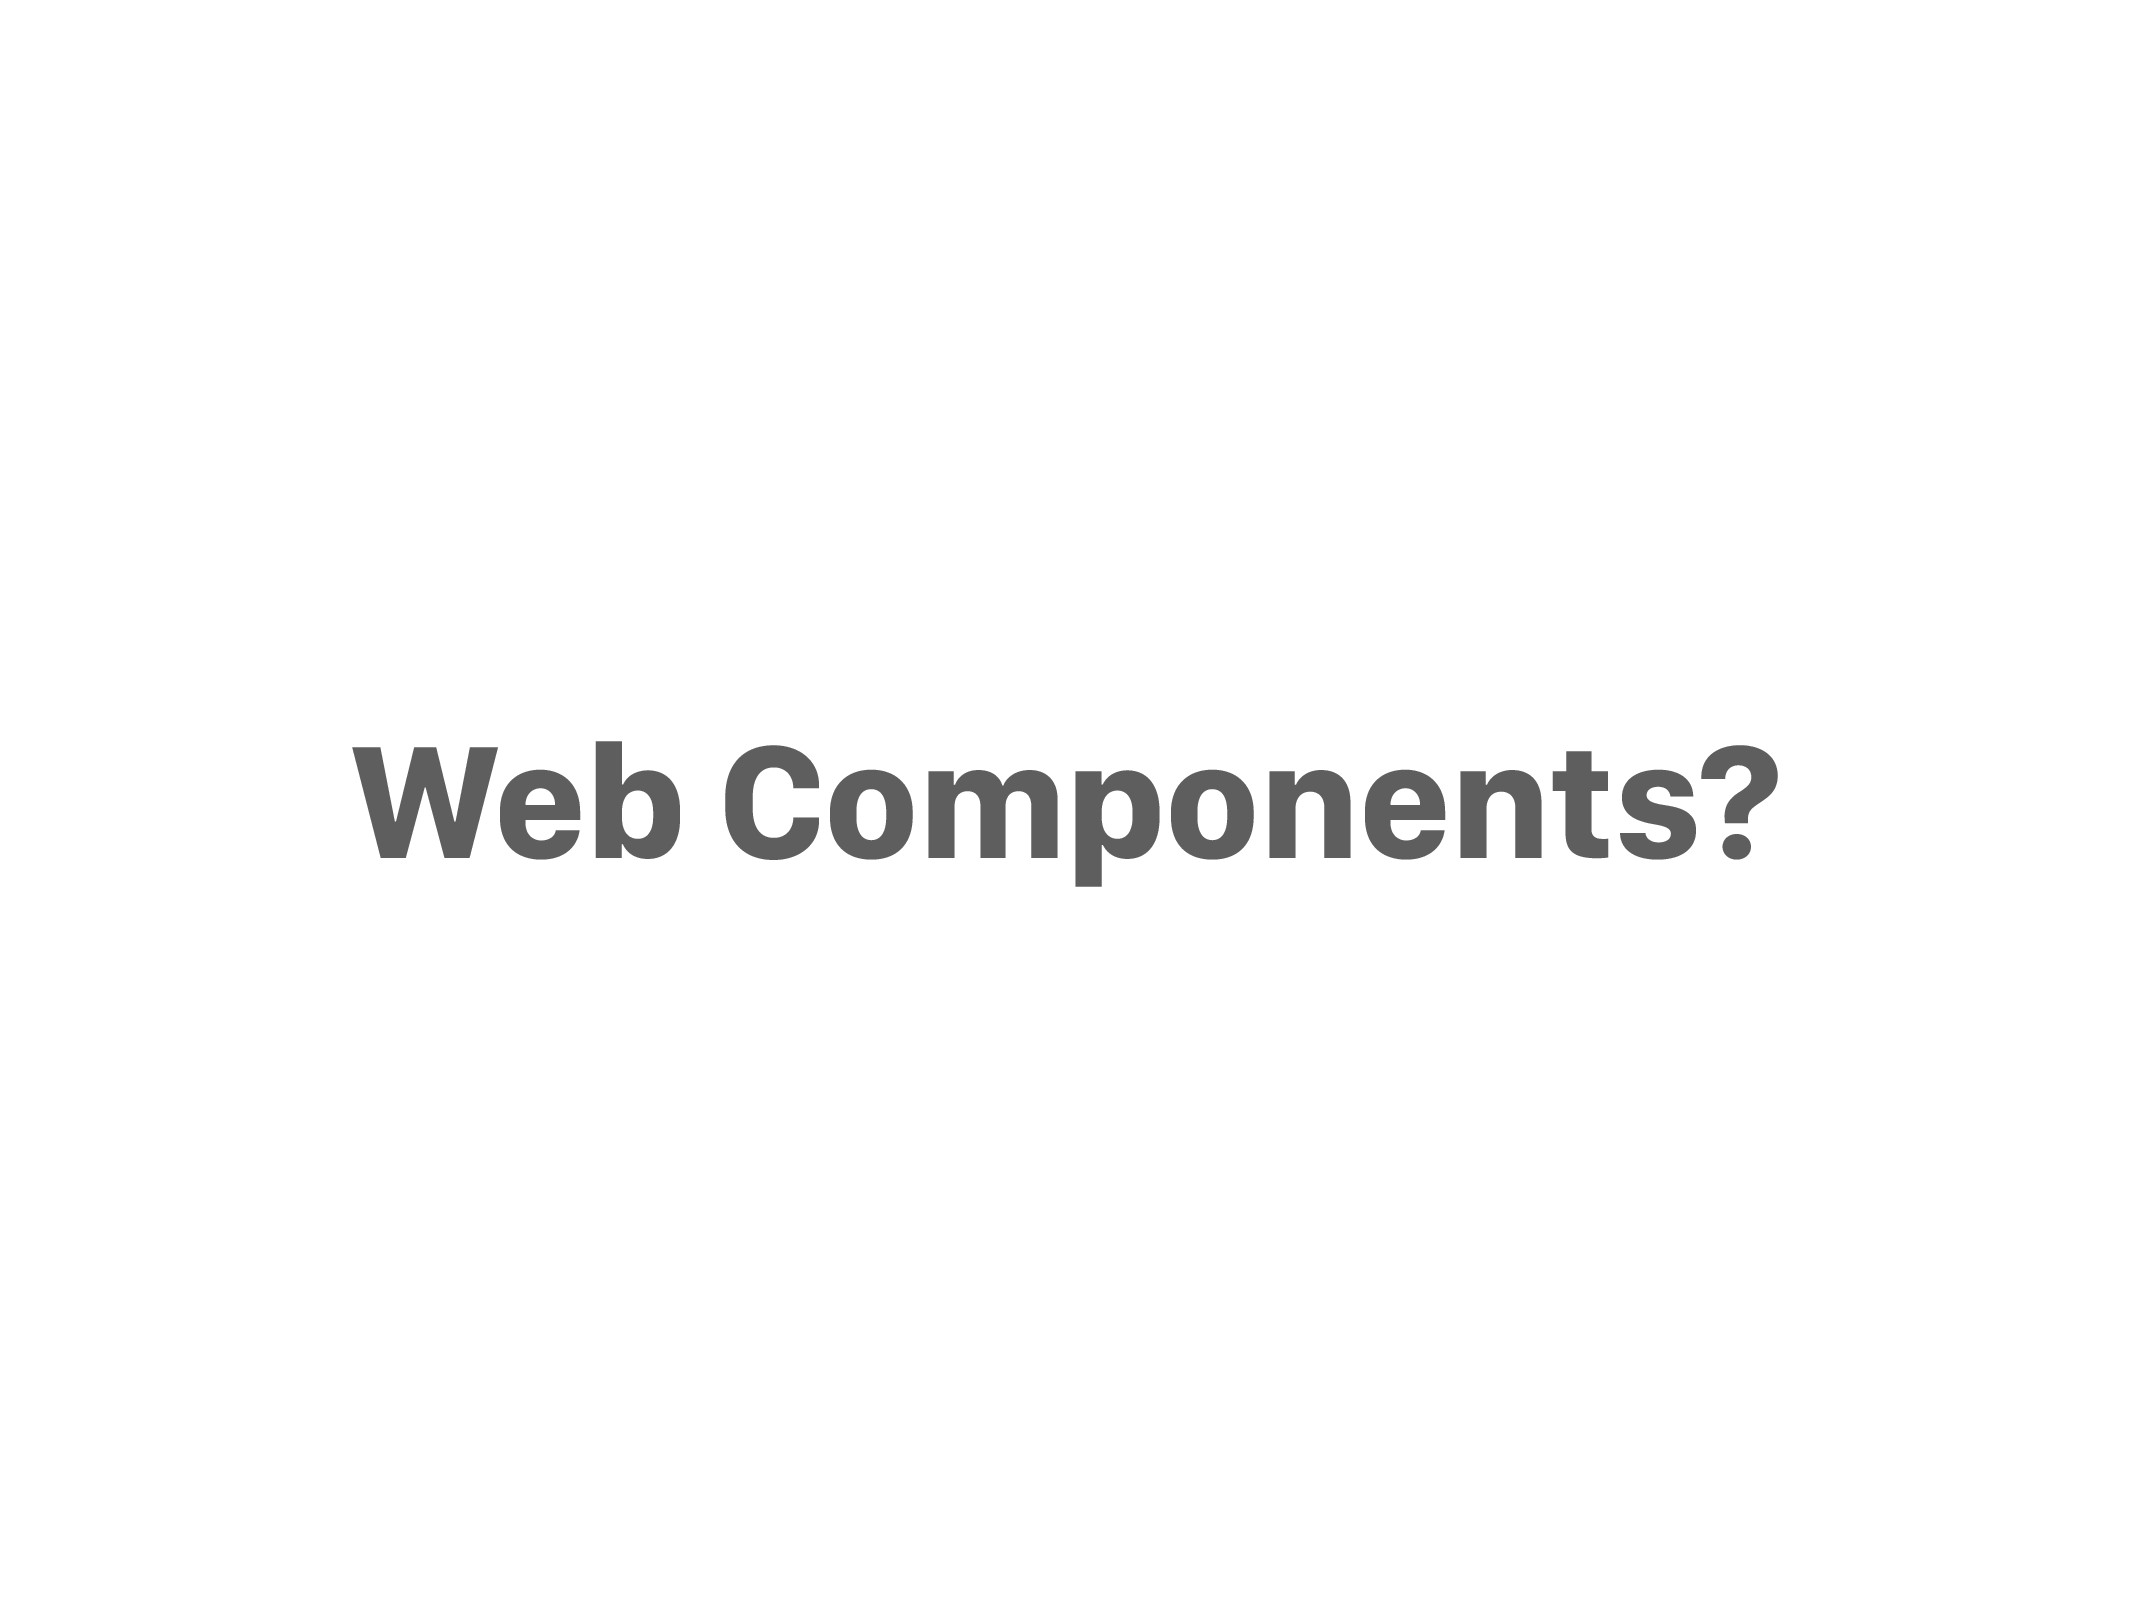 Web Components?